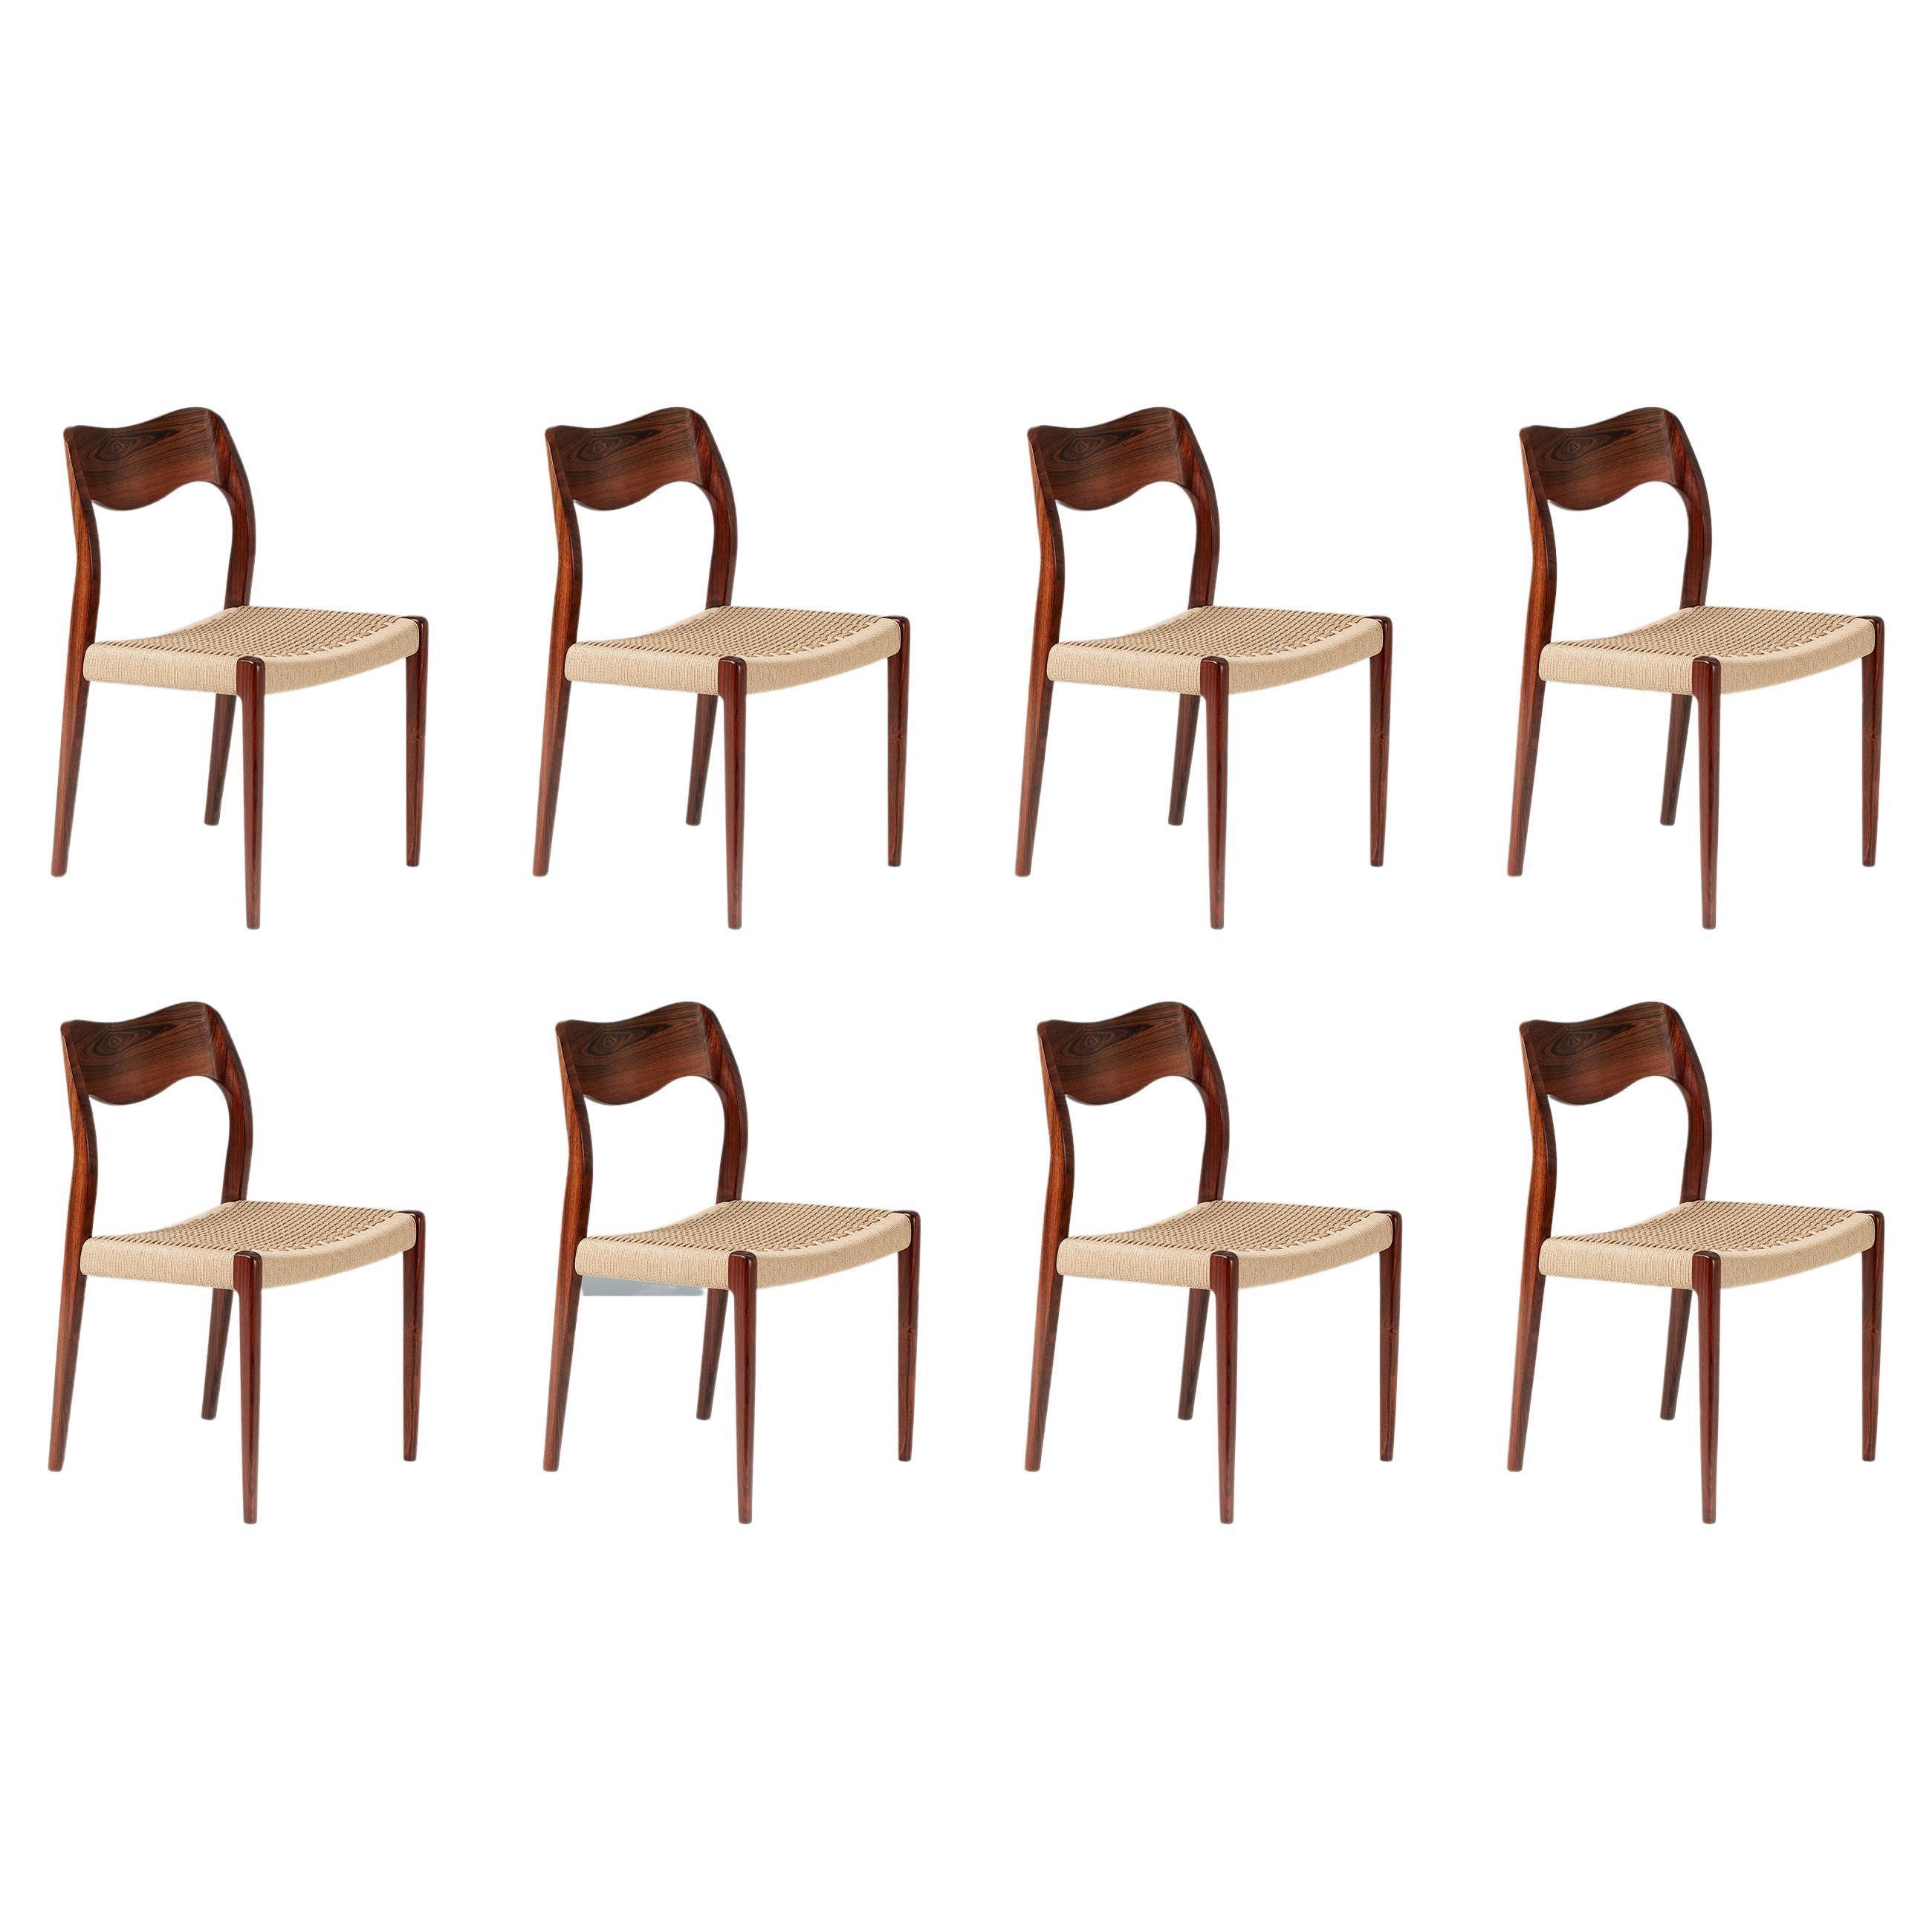 Set of 8 Niels Møller Model 71 Rosewood Dining Chairs